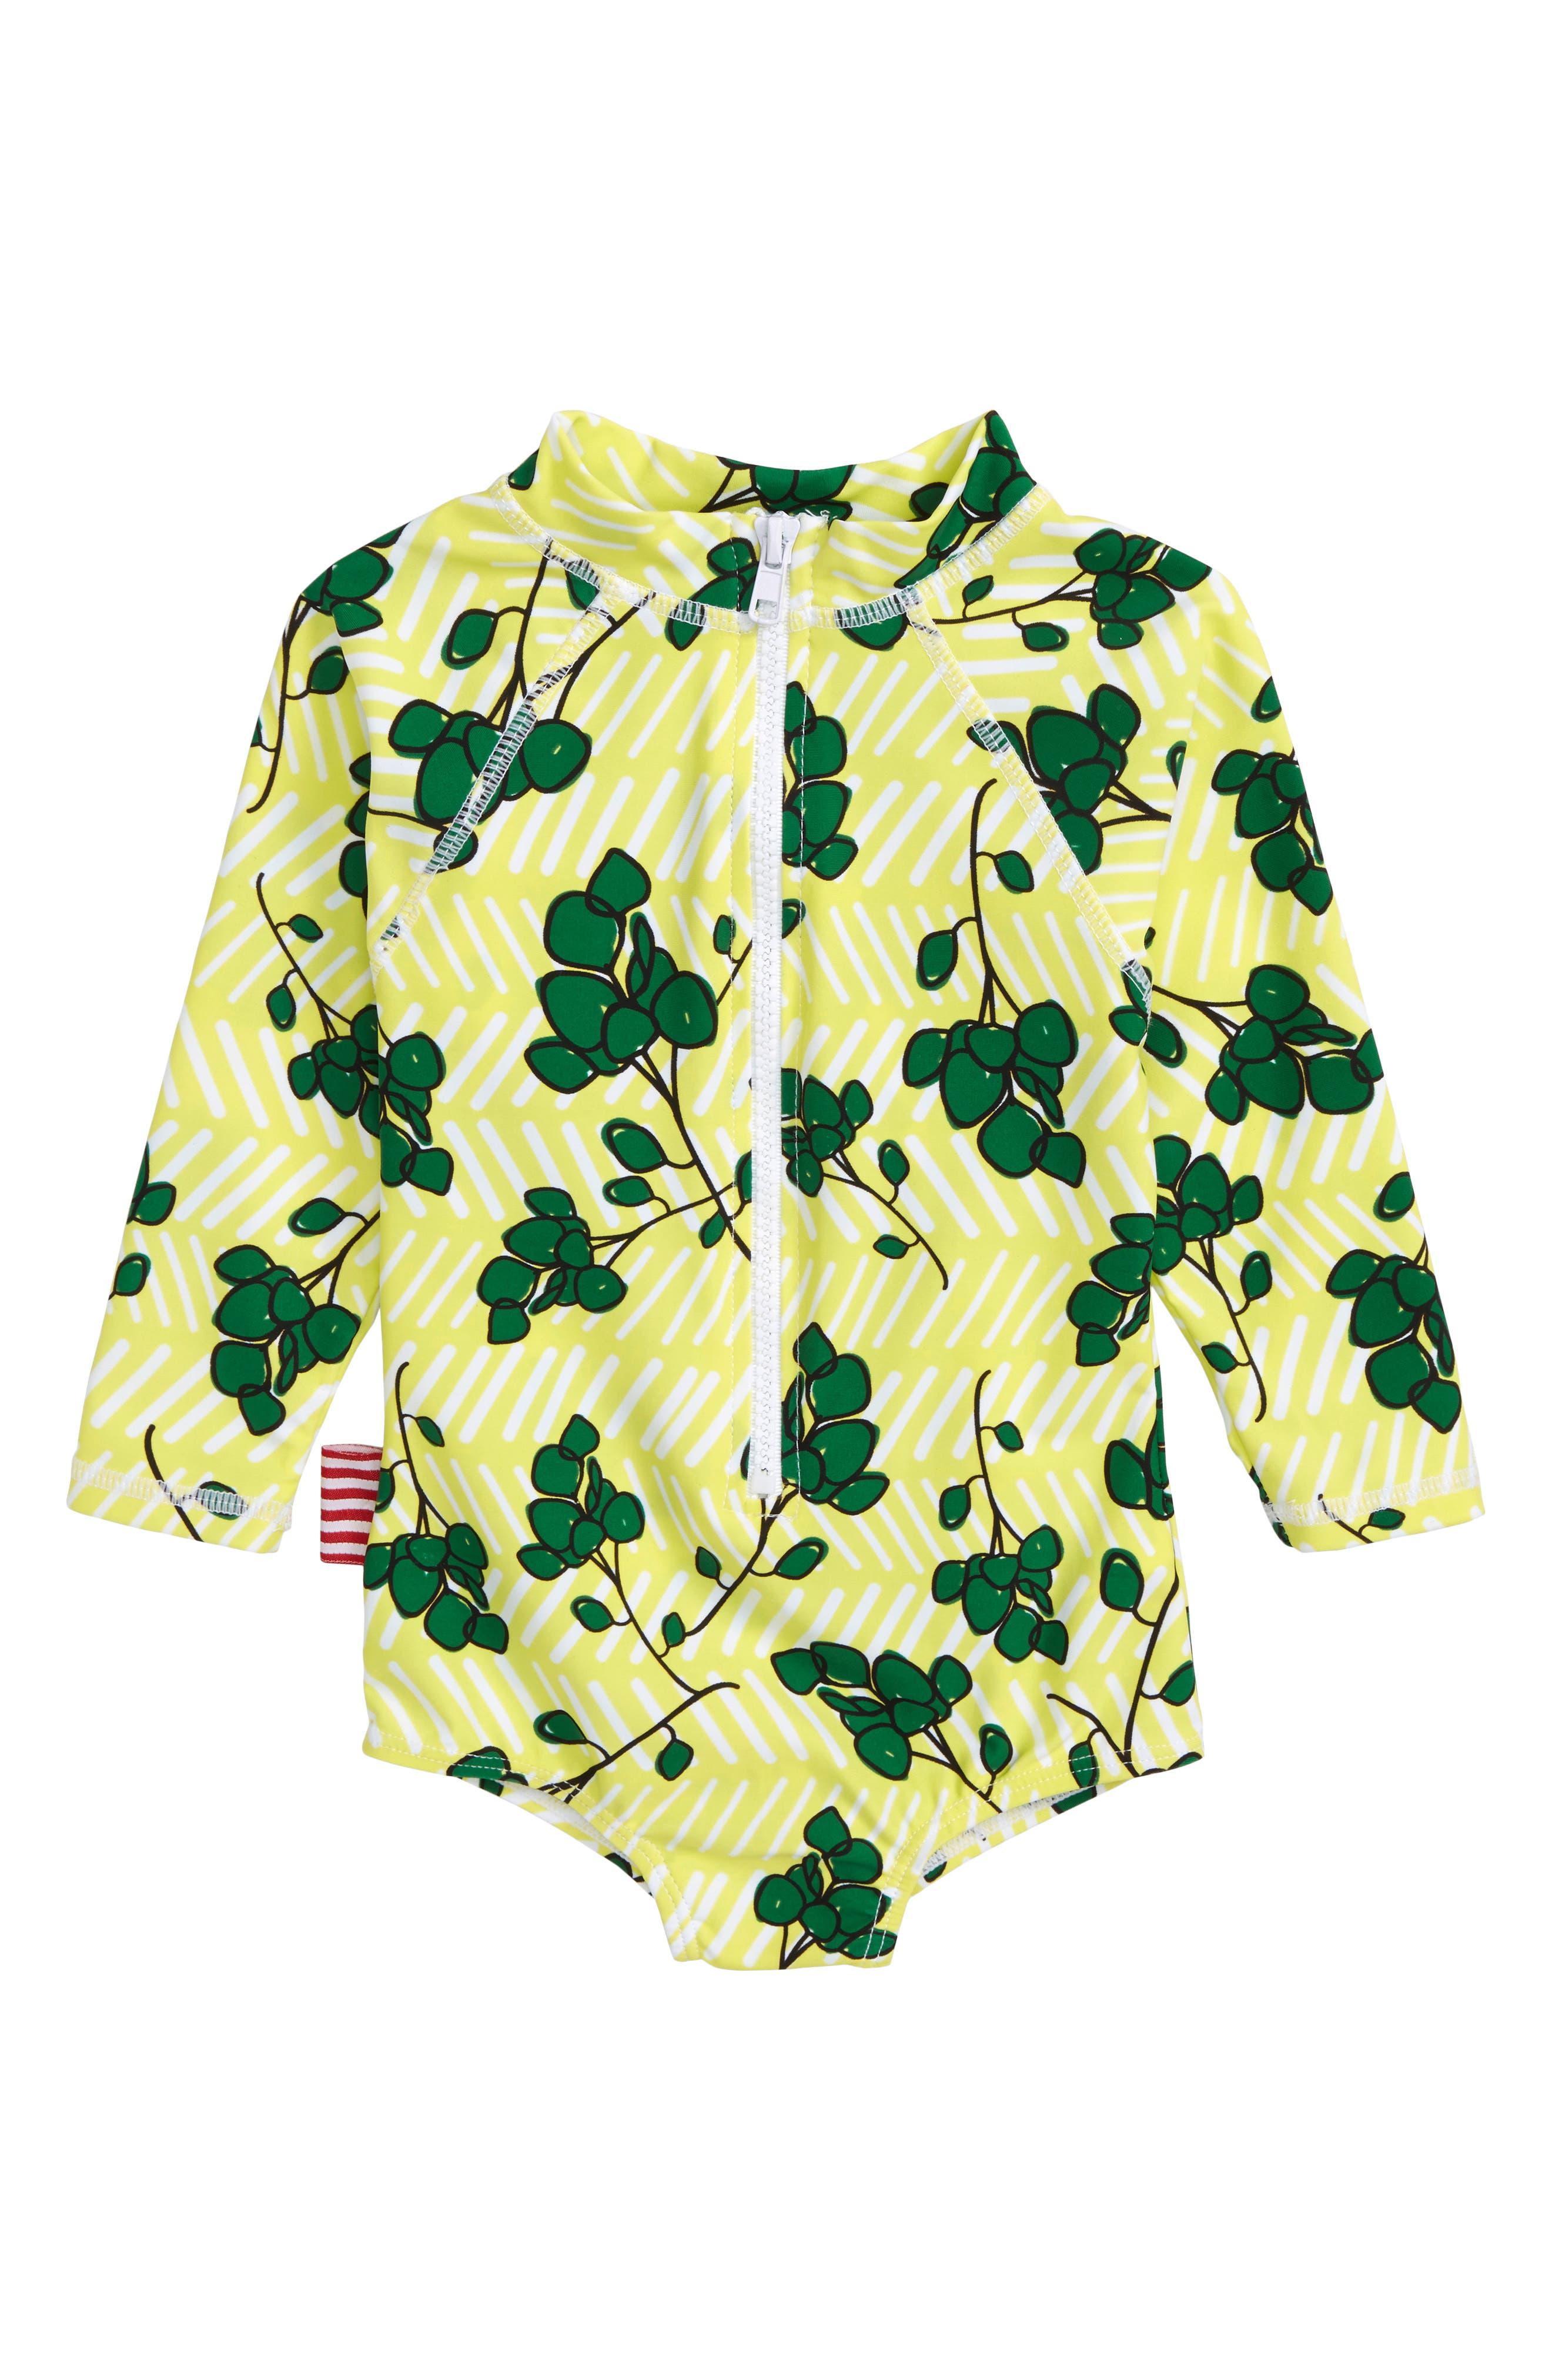 Limun One-Piece Rashguard Swimsuit,                             Main thumbnail 1, color,                             Yellow